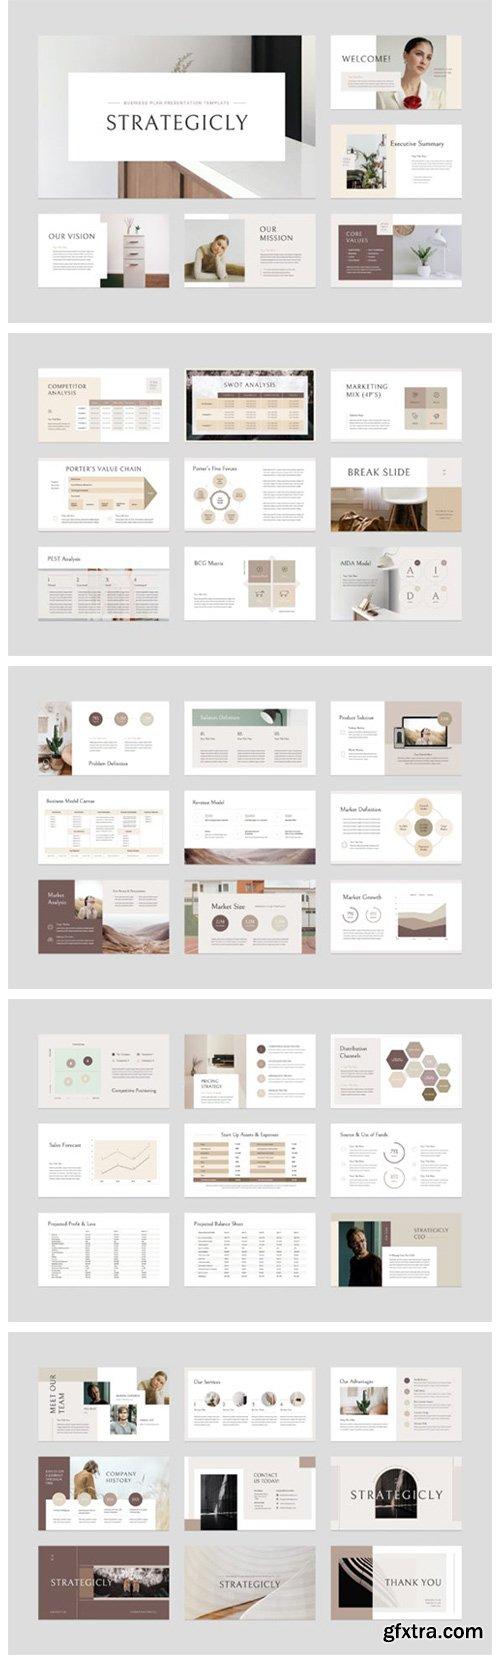 Business Plan PowerPoint Template 6508195